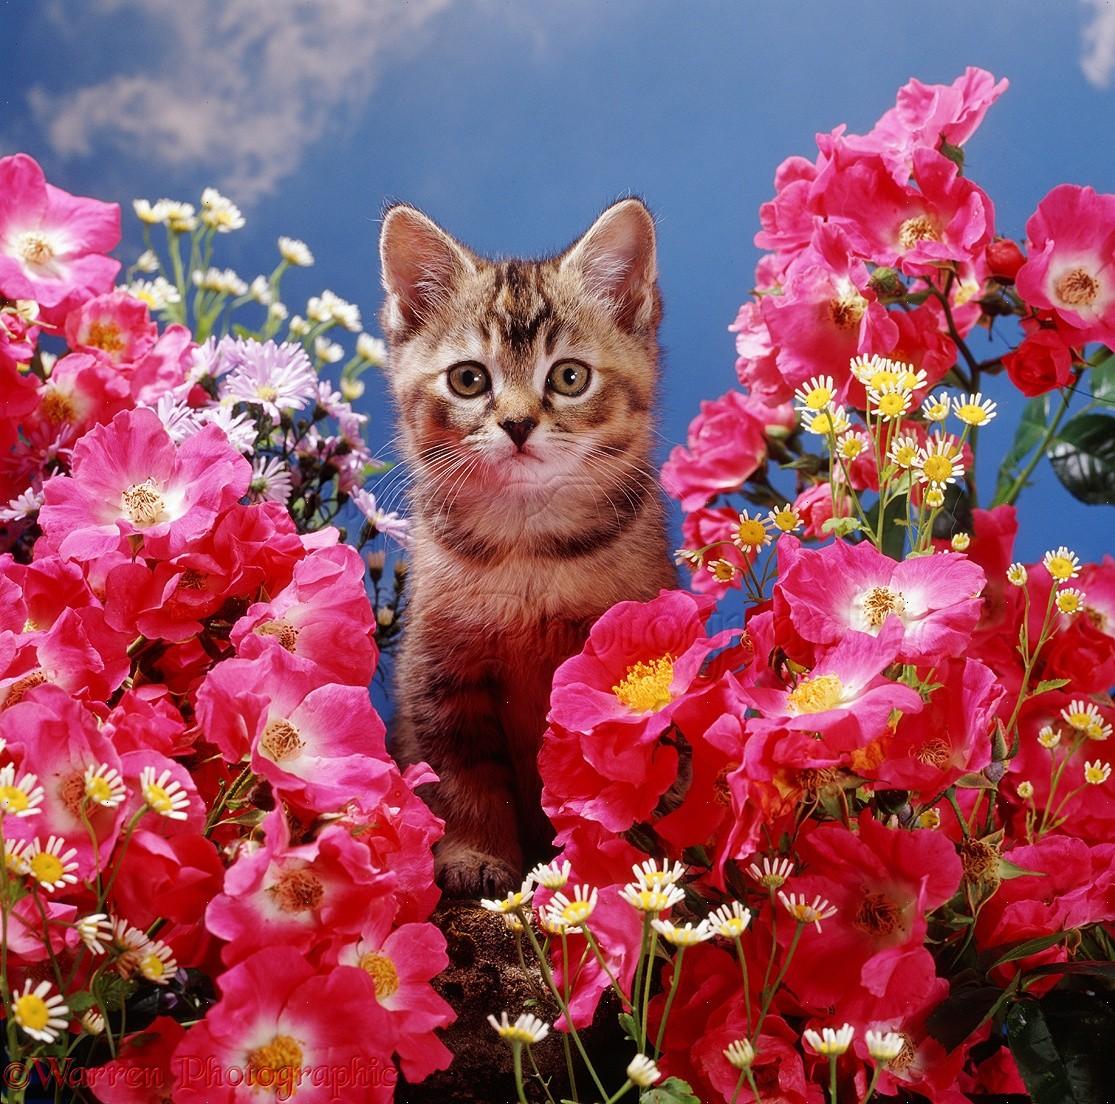 Kitten among pink rose flowers photo wp08197 tabby burmilla kitten among american pillar roses with feverfew mightylinksfo